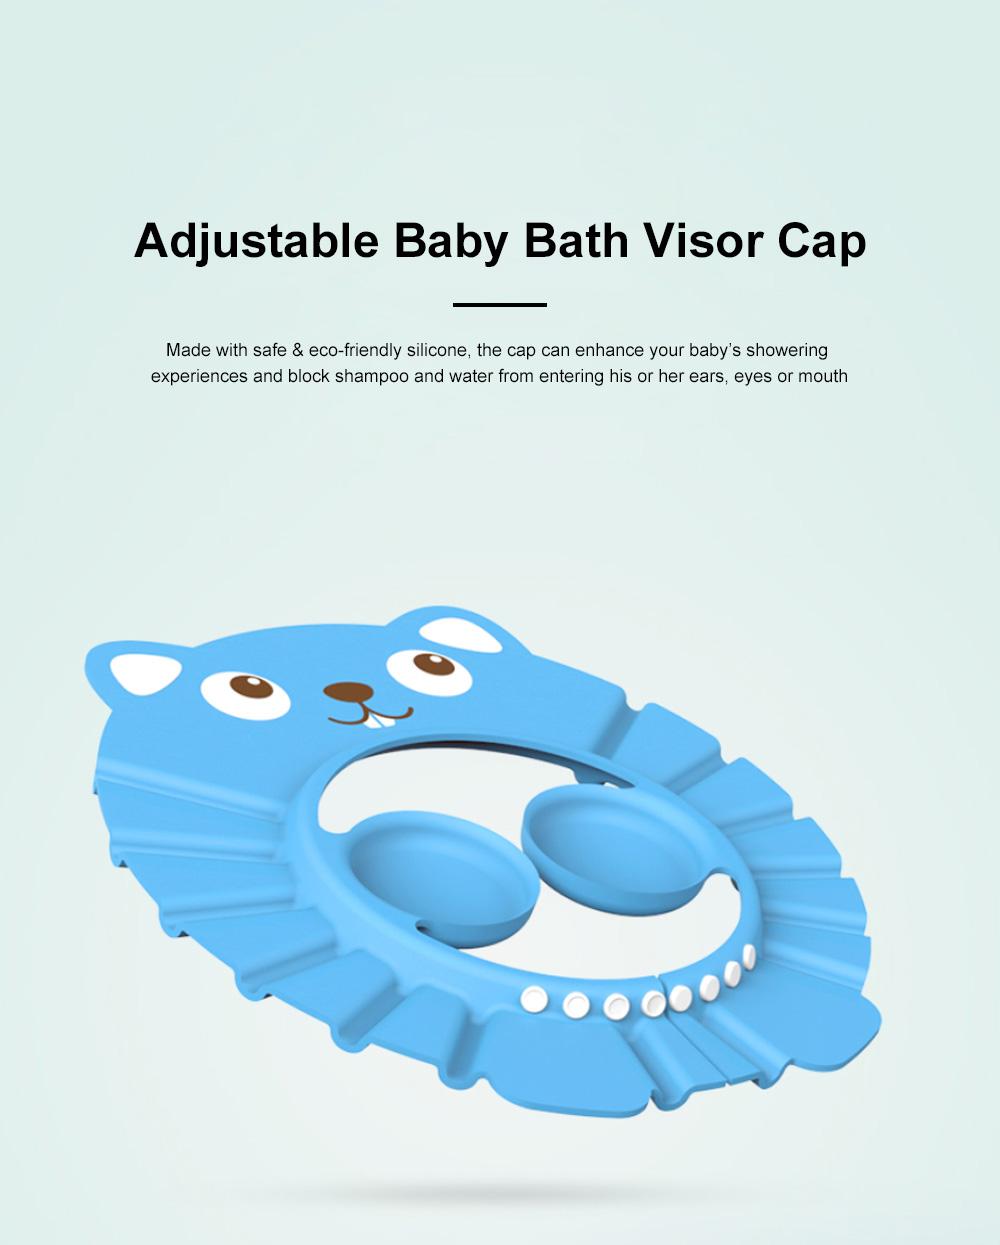 Adjustable Baby Bath Visor Cap Waterproof & Elastic Ring Hat for Shower, Bathtub, Sun Bathing, Hair Cutting 0